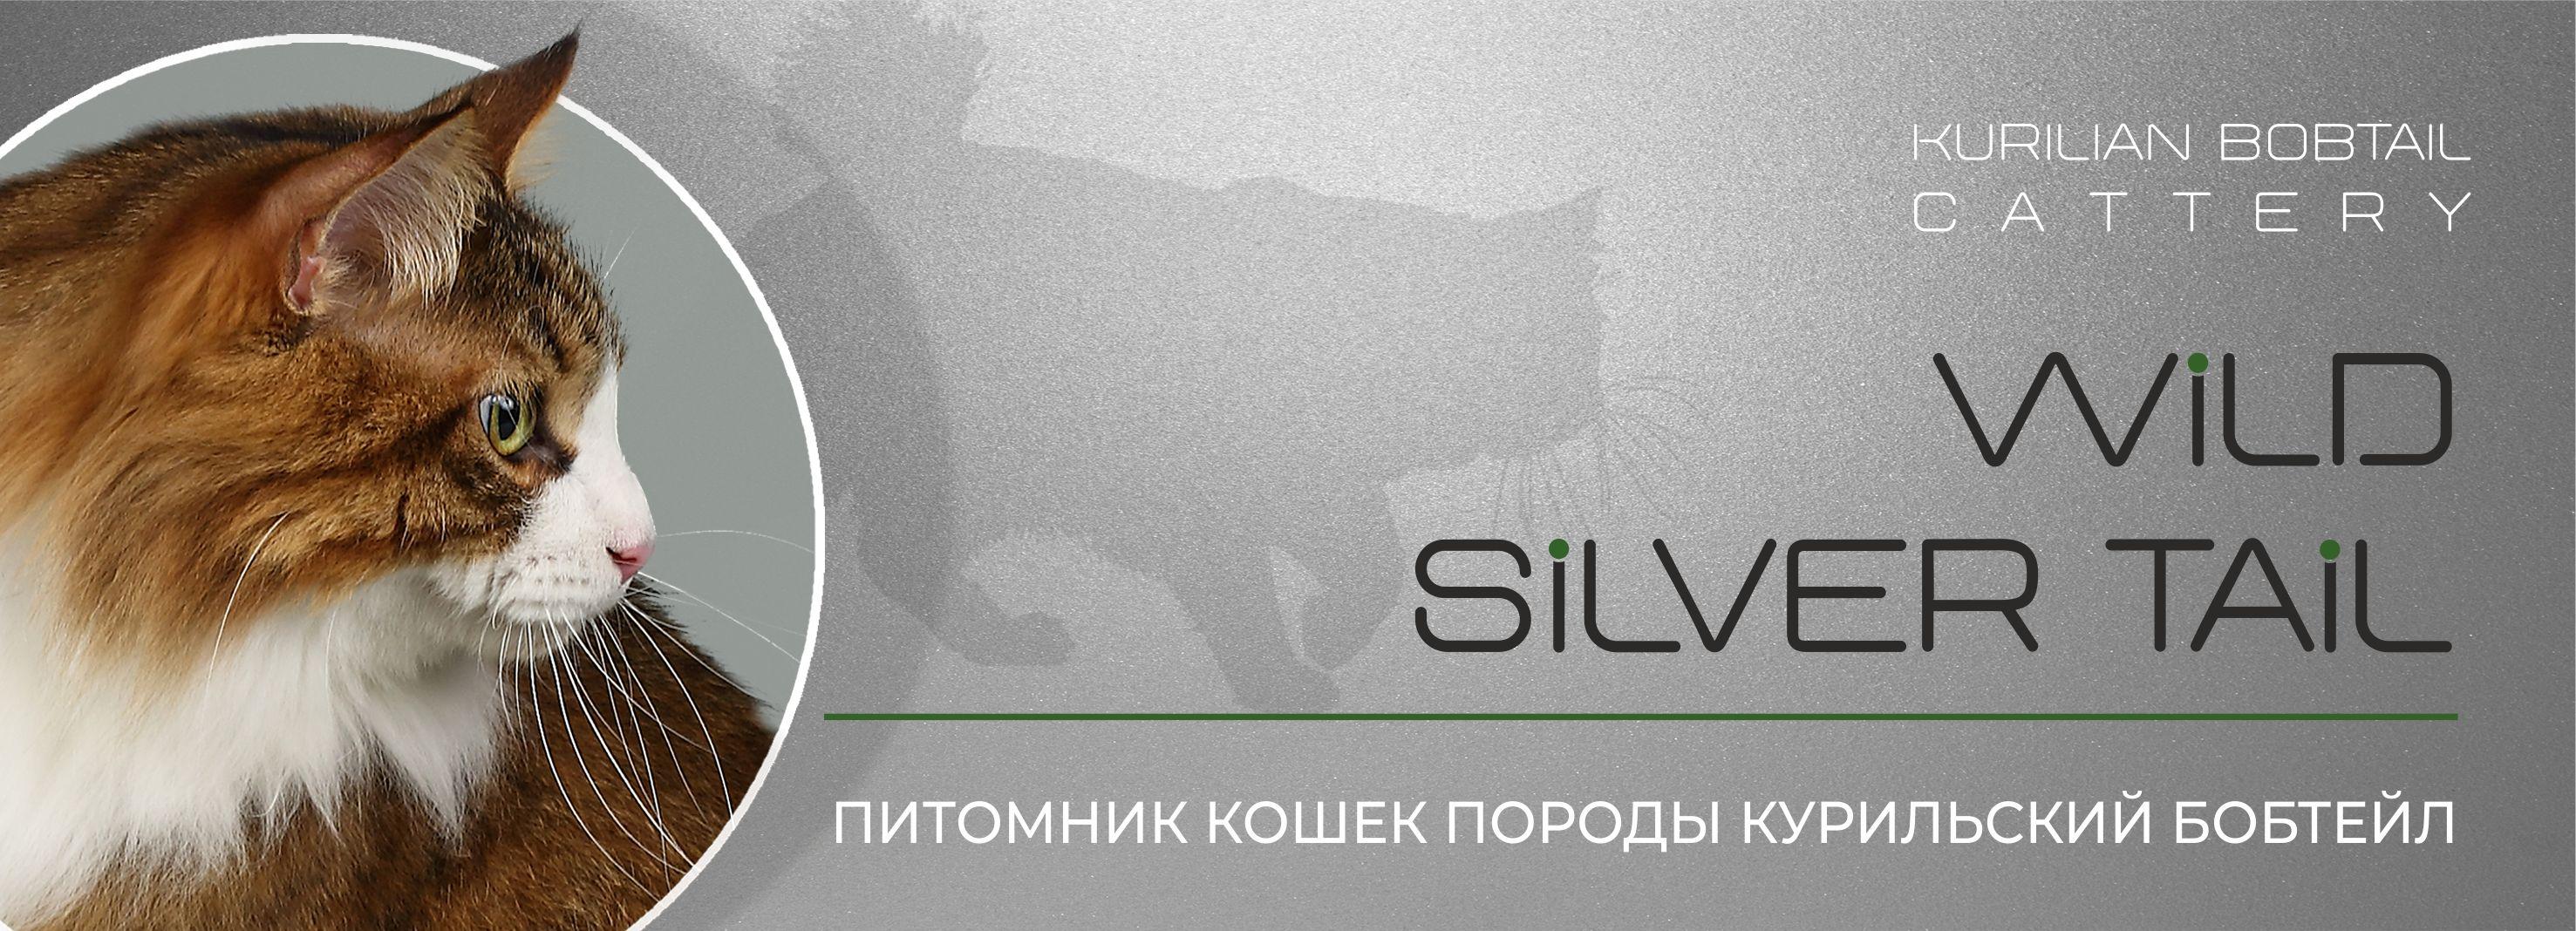 Питомник курильских бобтейлов Wild Silver Tail